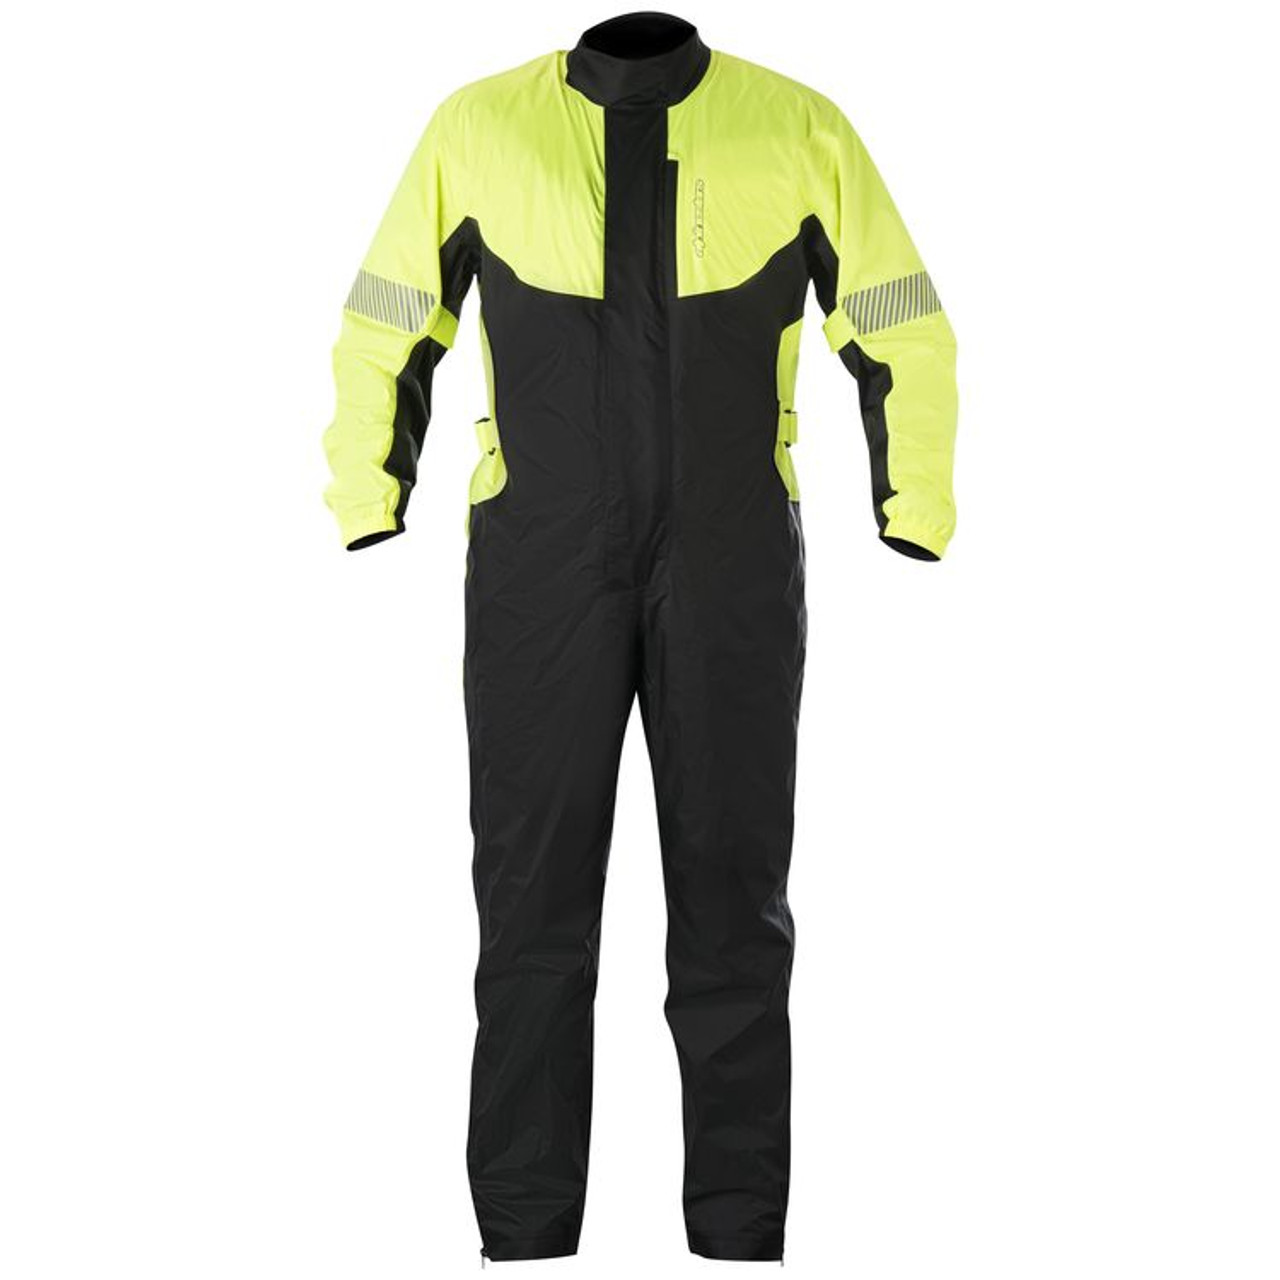 Alpinestars HURRICANE Motorcycle Rain Jacket Flo Yellow//Black Choose Size